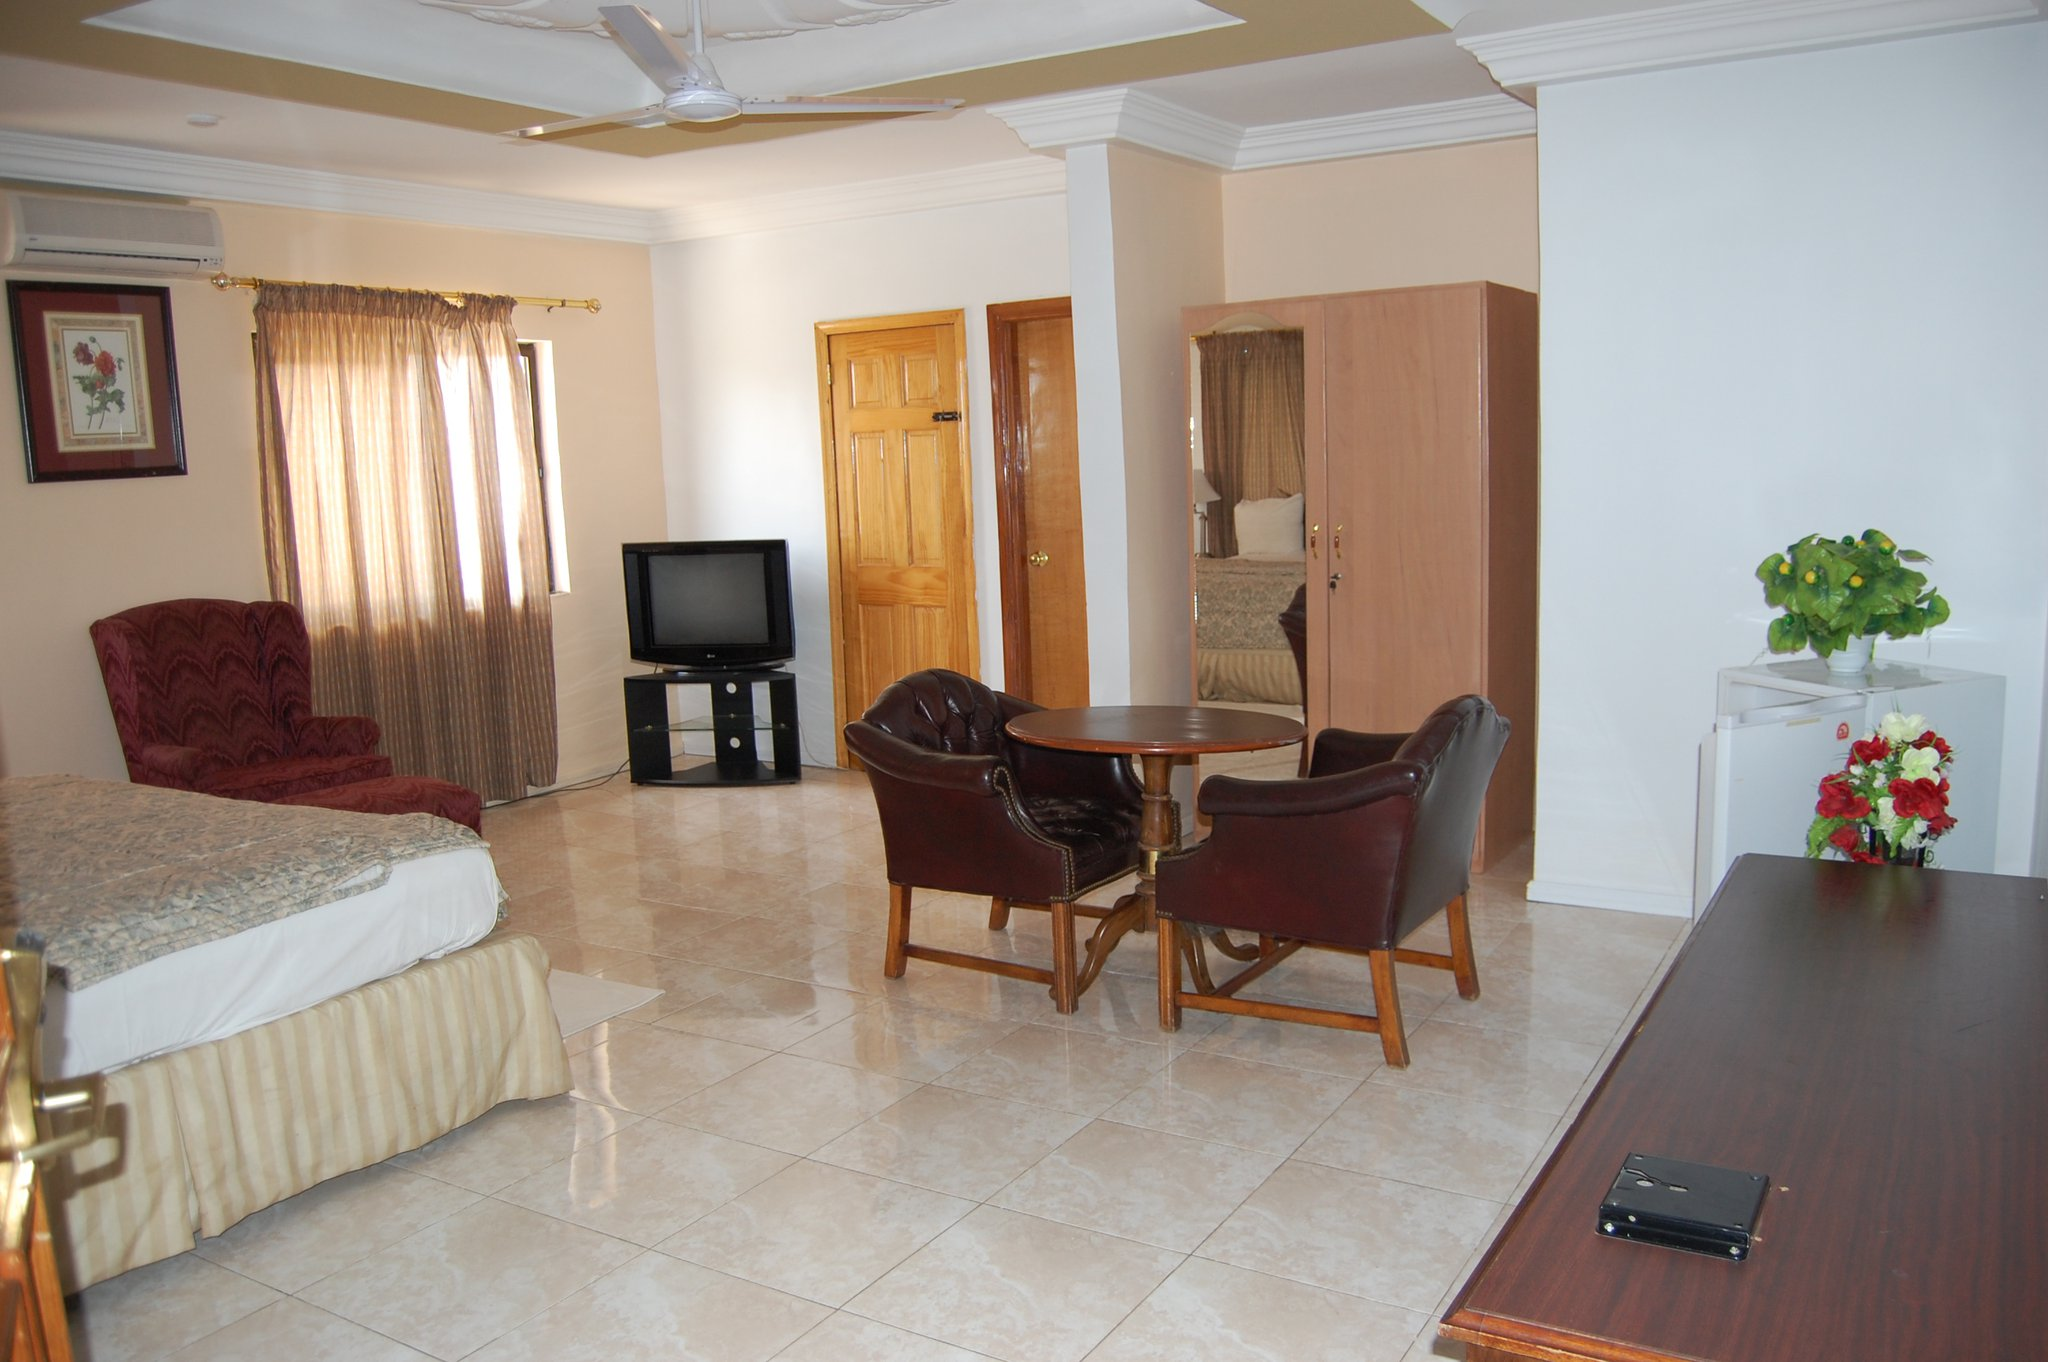 Ghlisting Hotels in Ghana, Events in Ghana |   adonaiH31